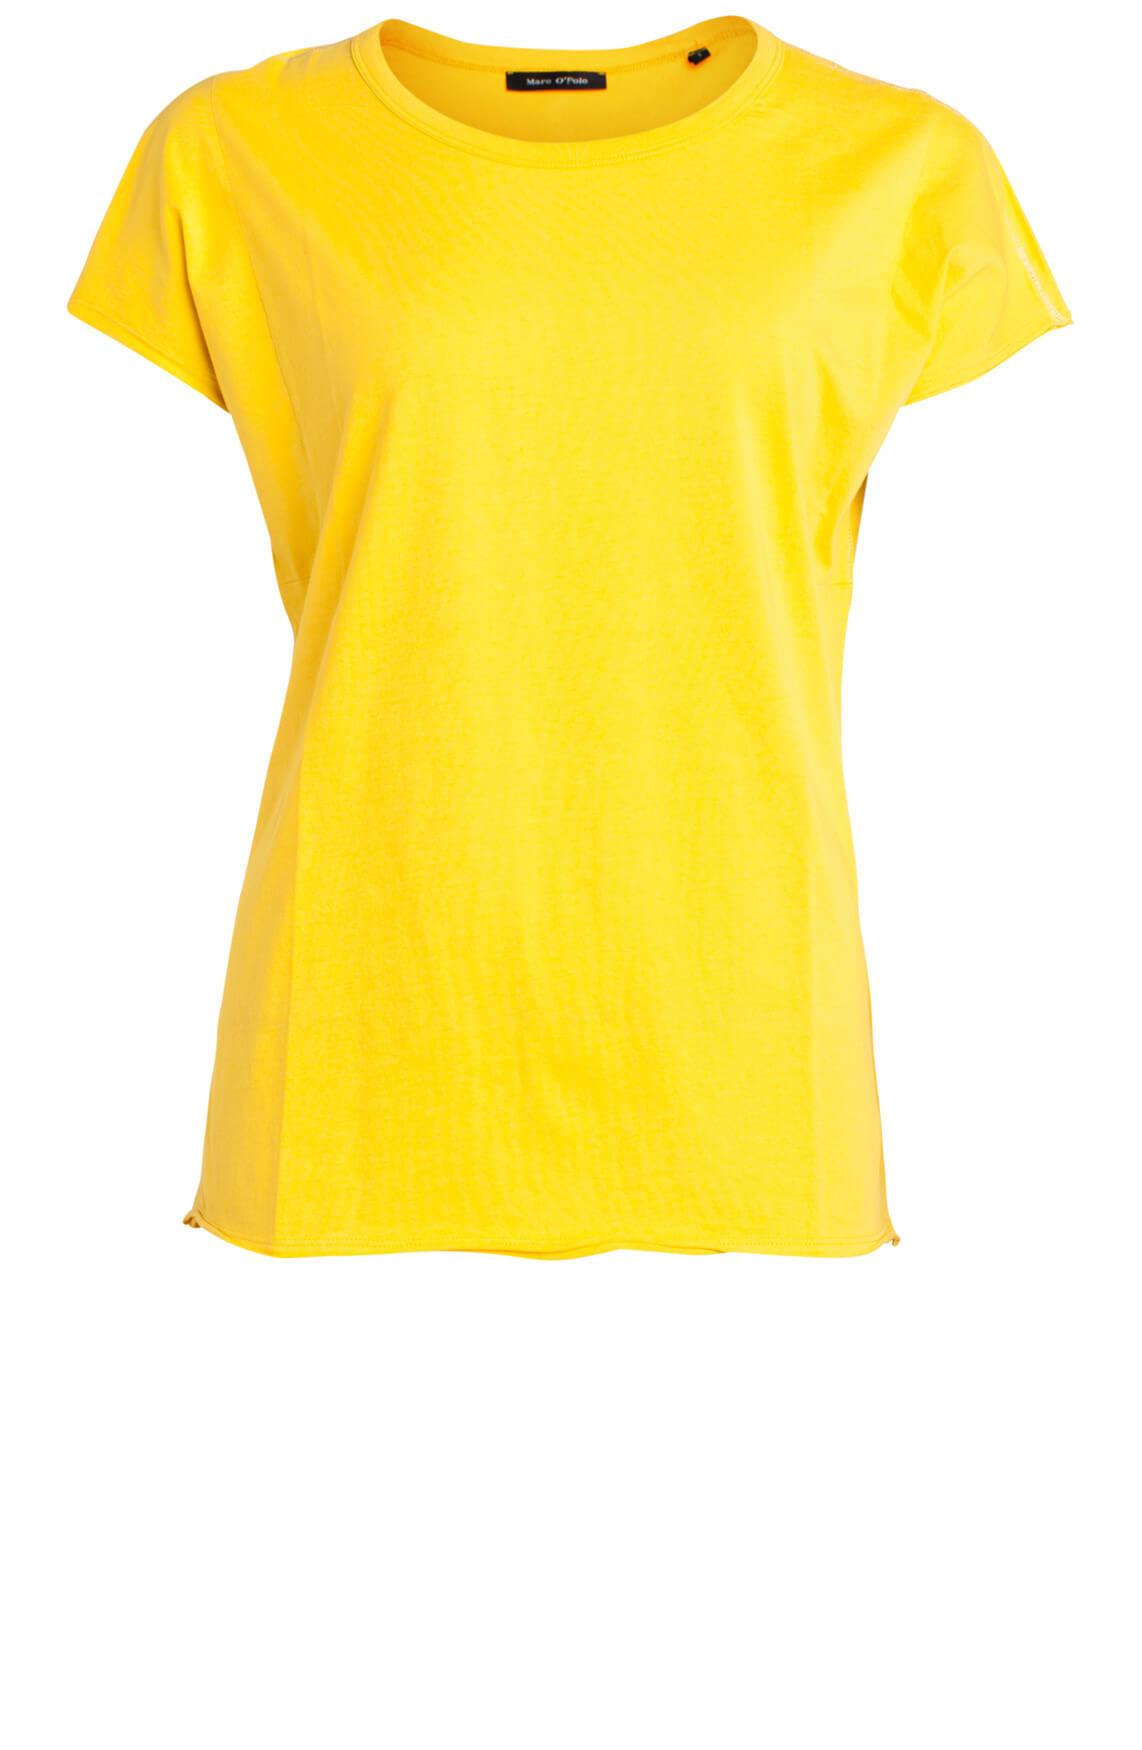 Marc O'Polo Dames Shirt yellow geel